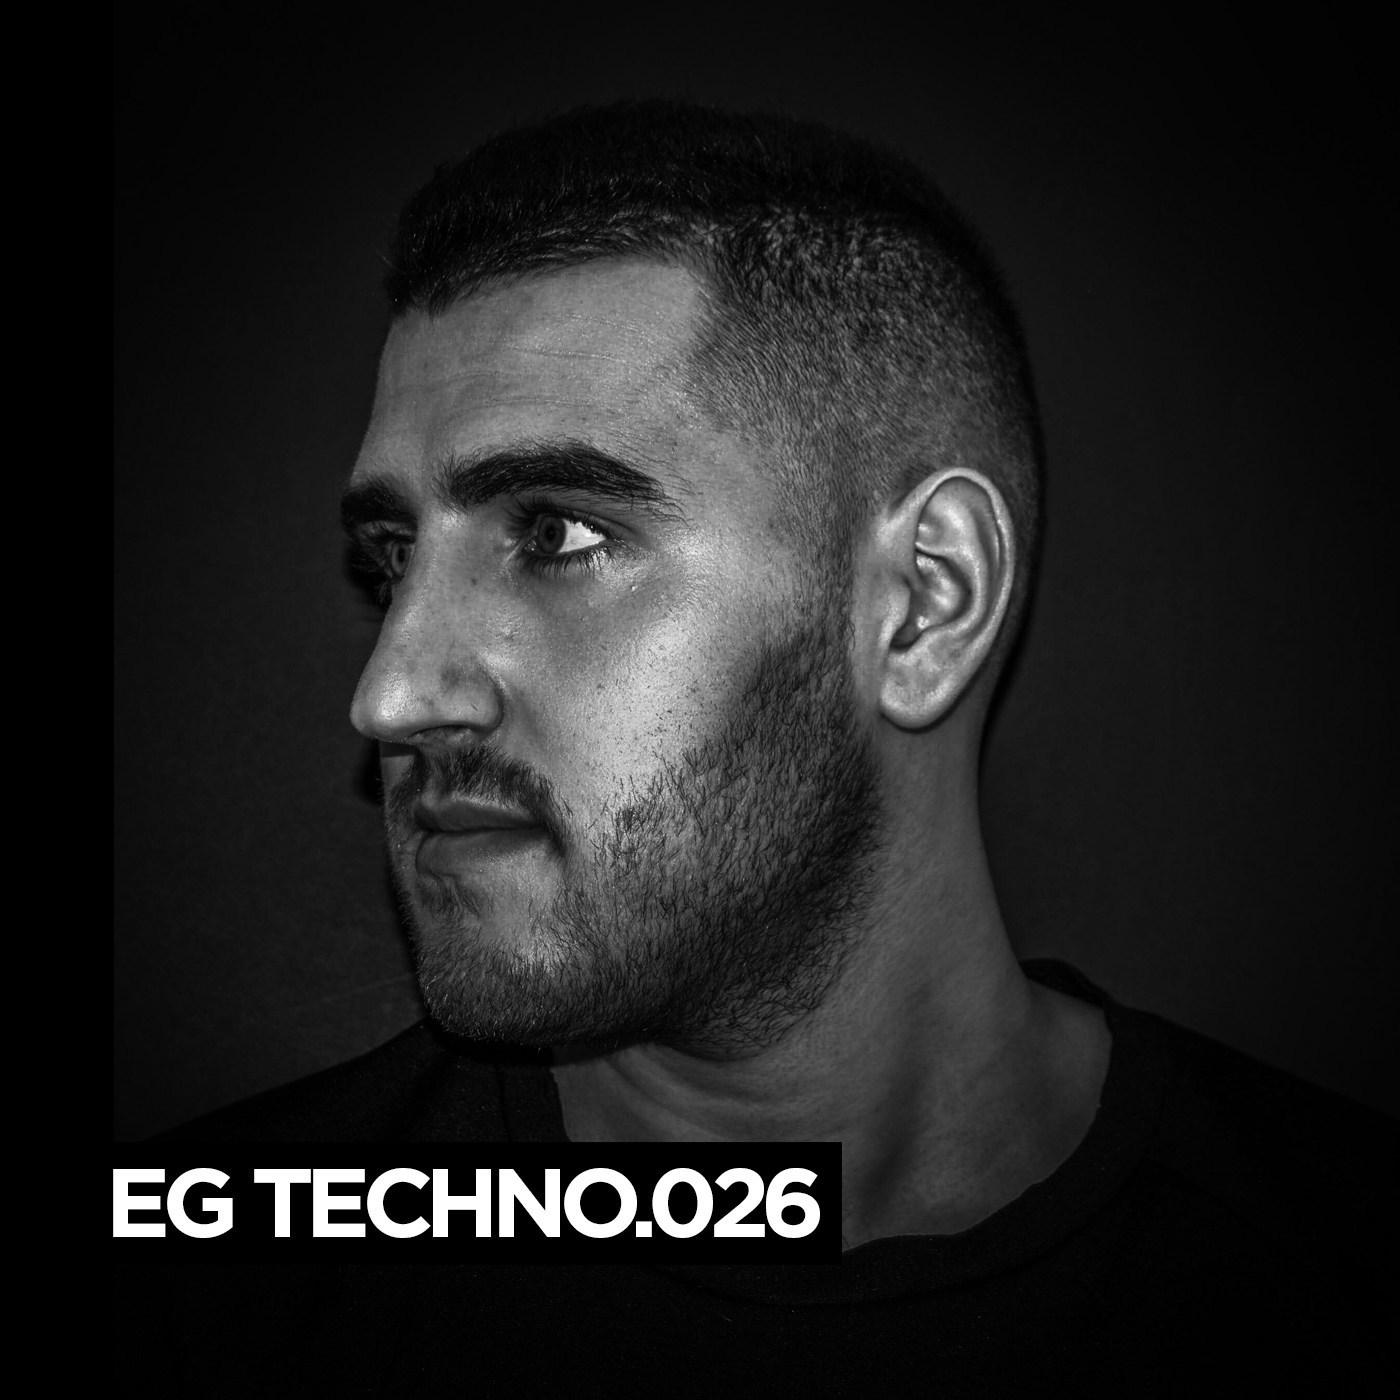 EG-TECHNO-026-Mayfie